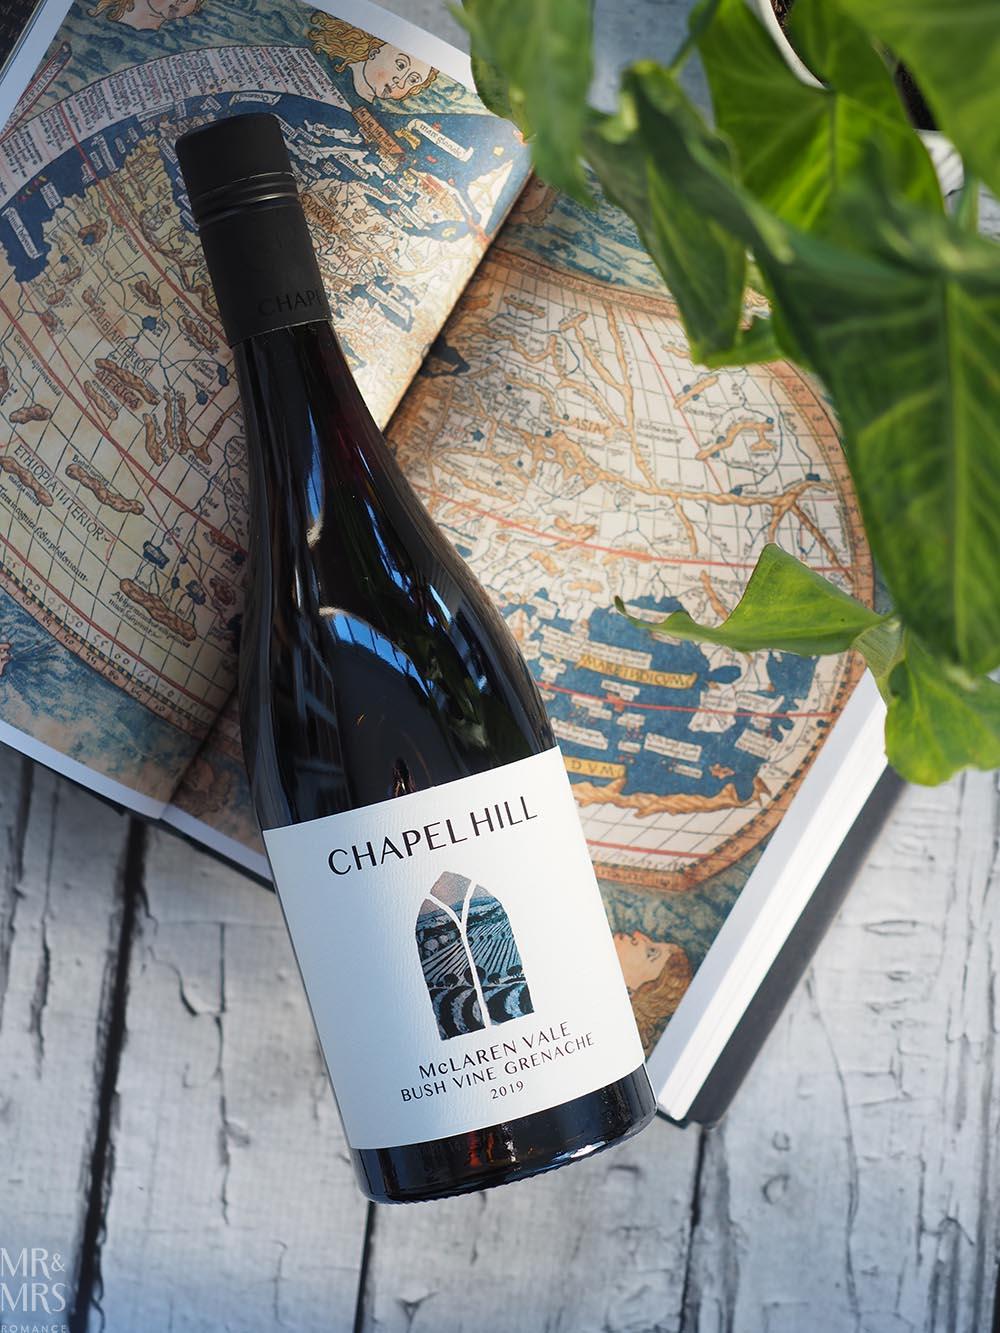 5 Grenache for World Grenache Day - Chapel Hill Bush Vine Grenache